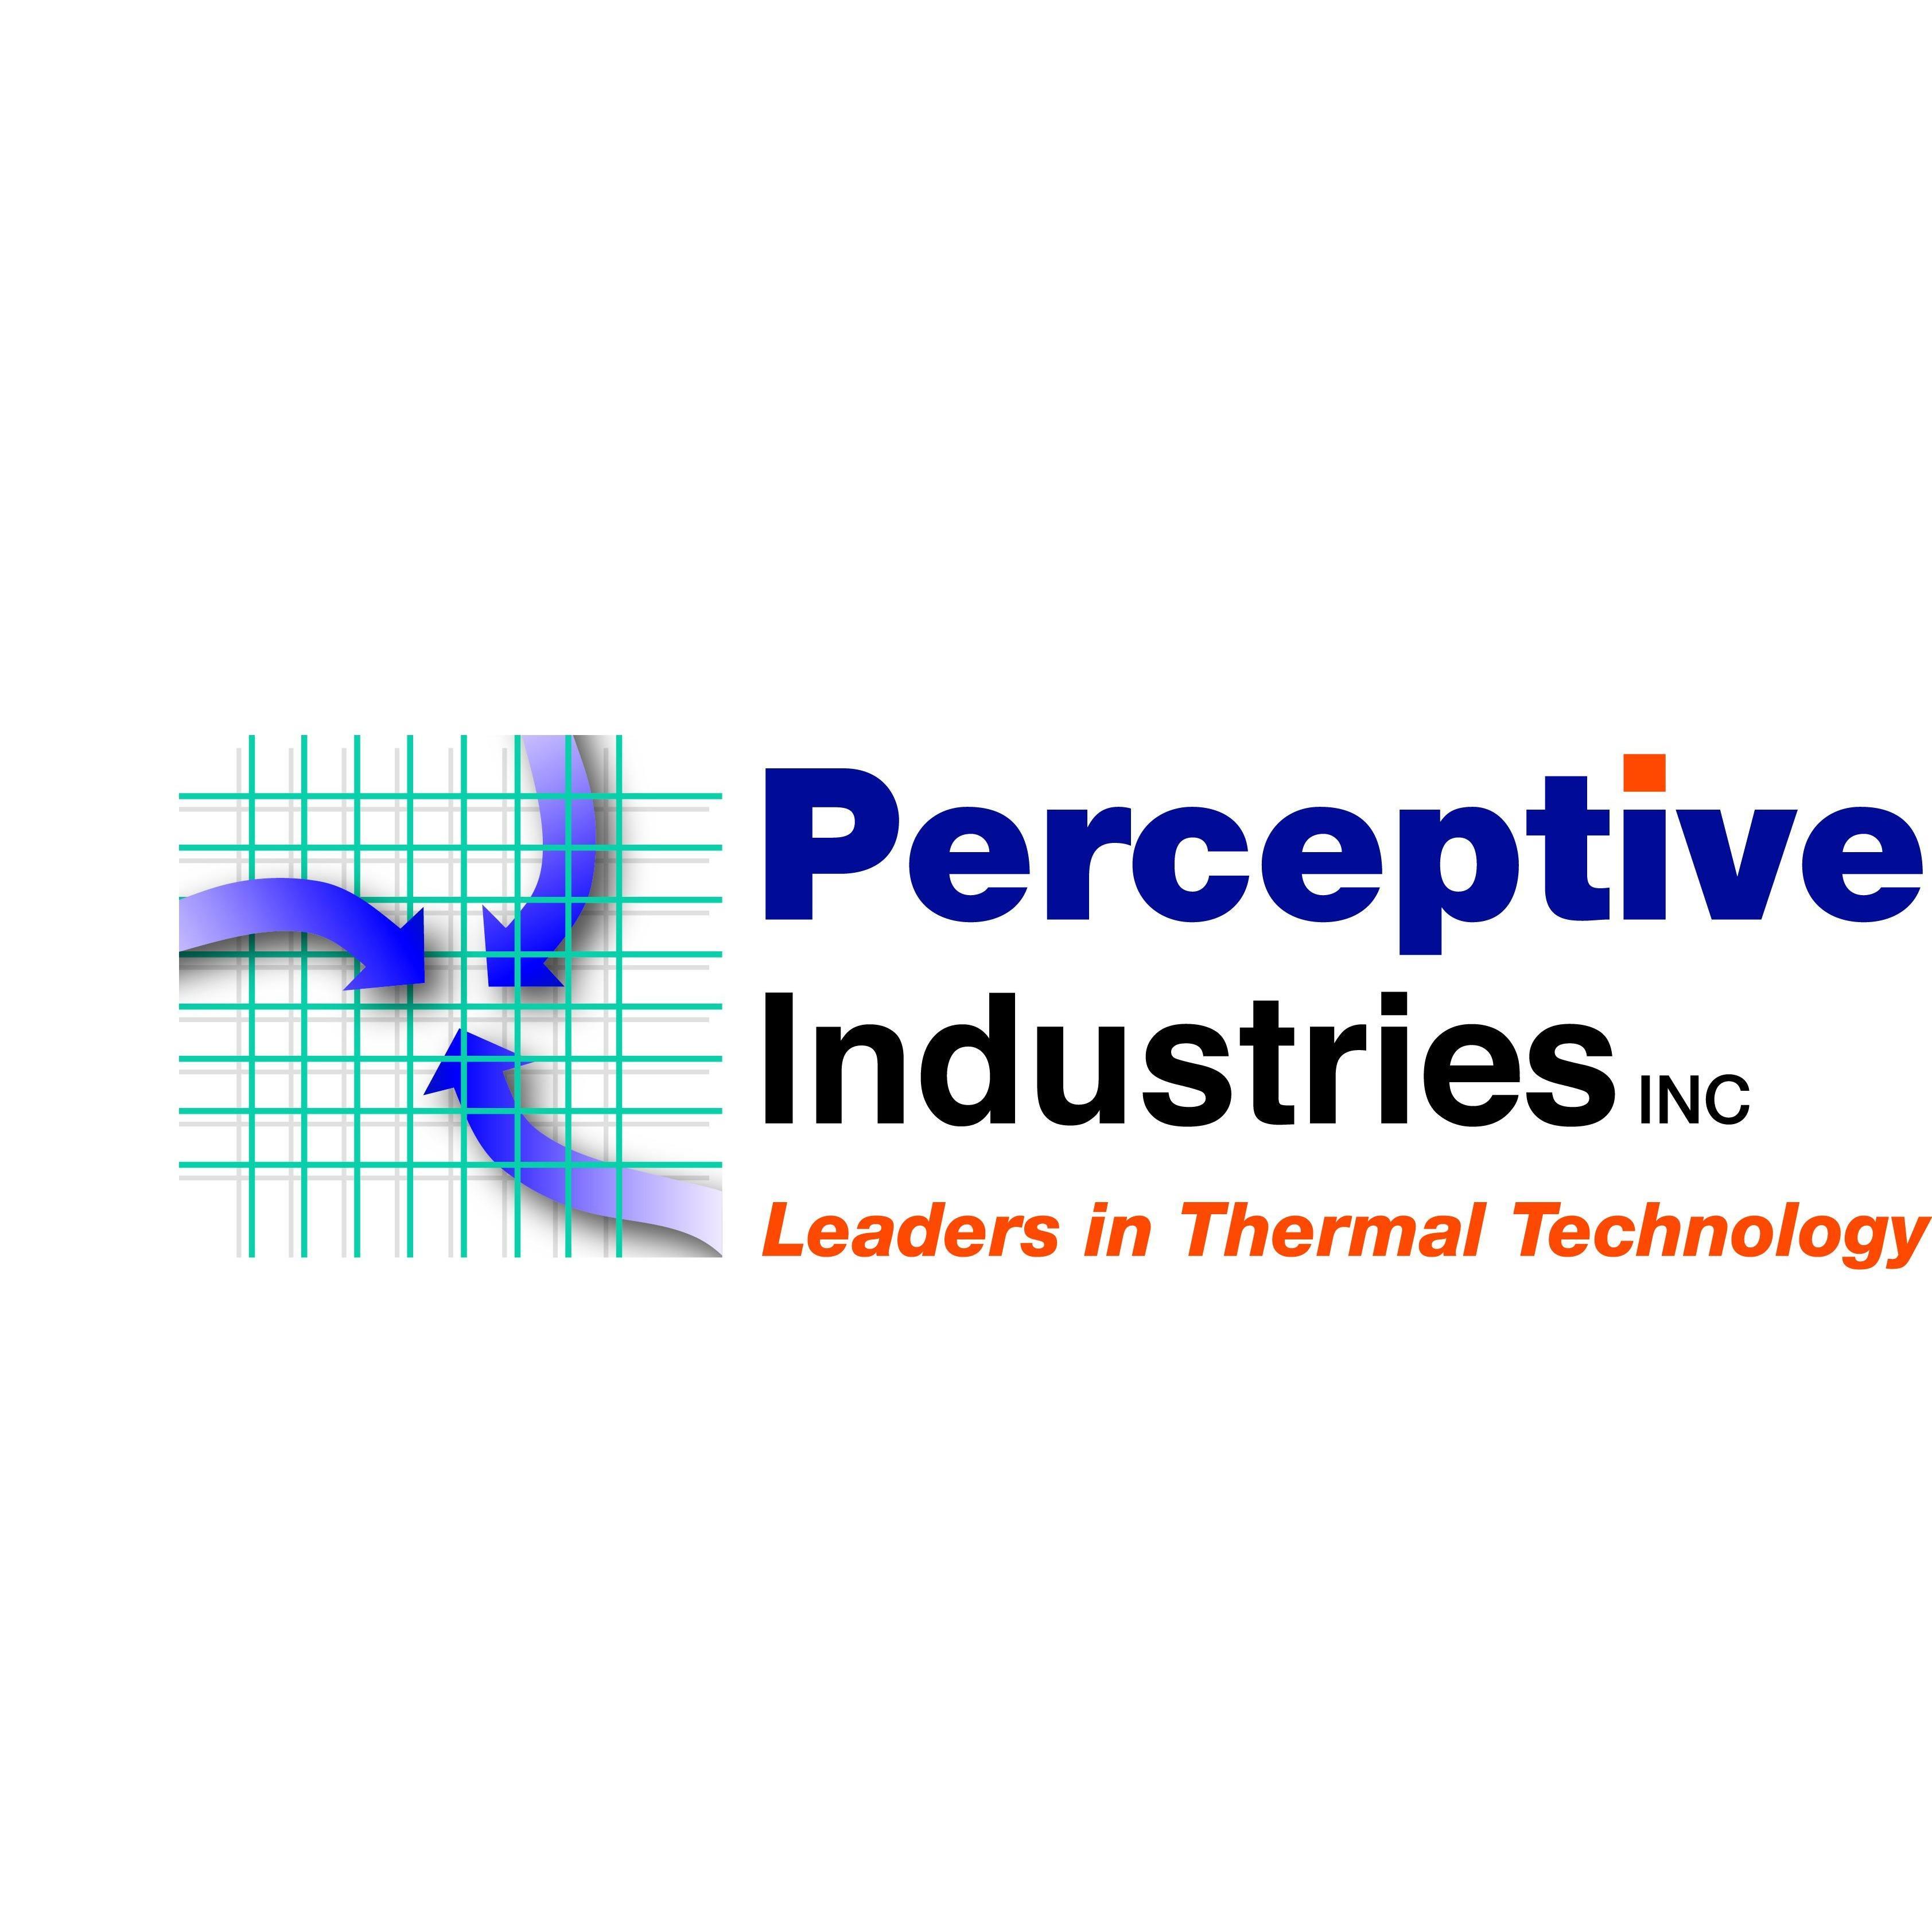 Perceptive Industries, Inc.